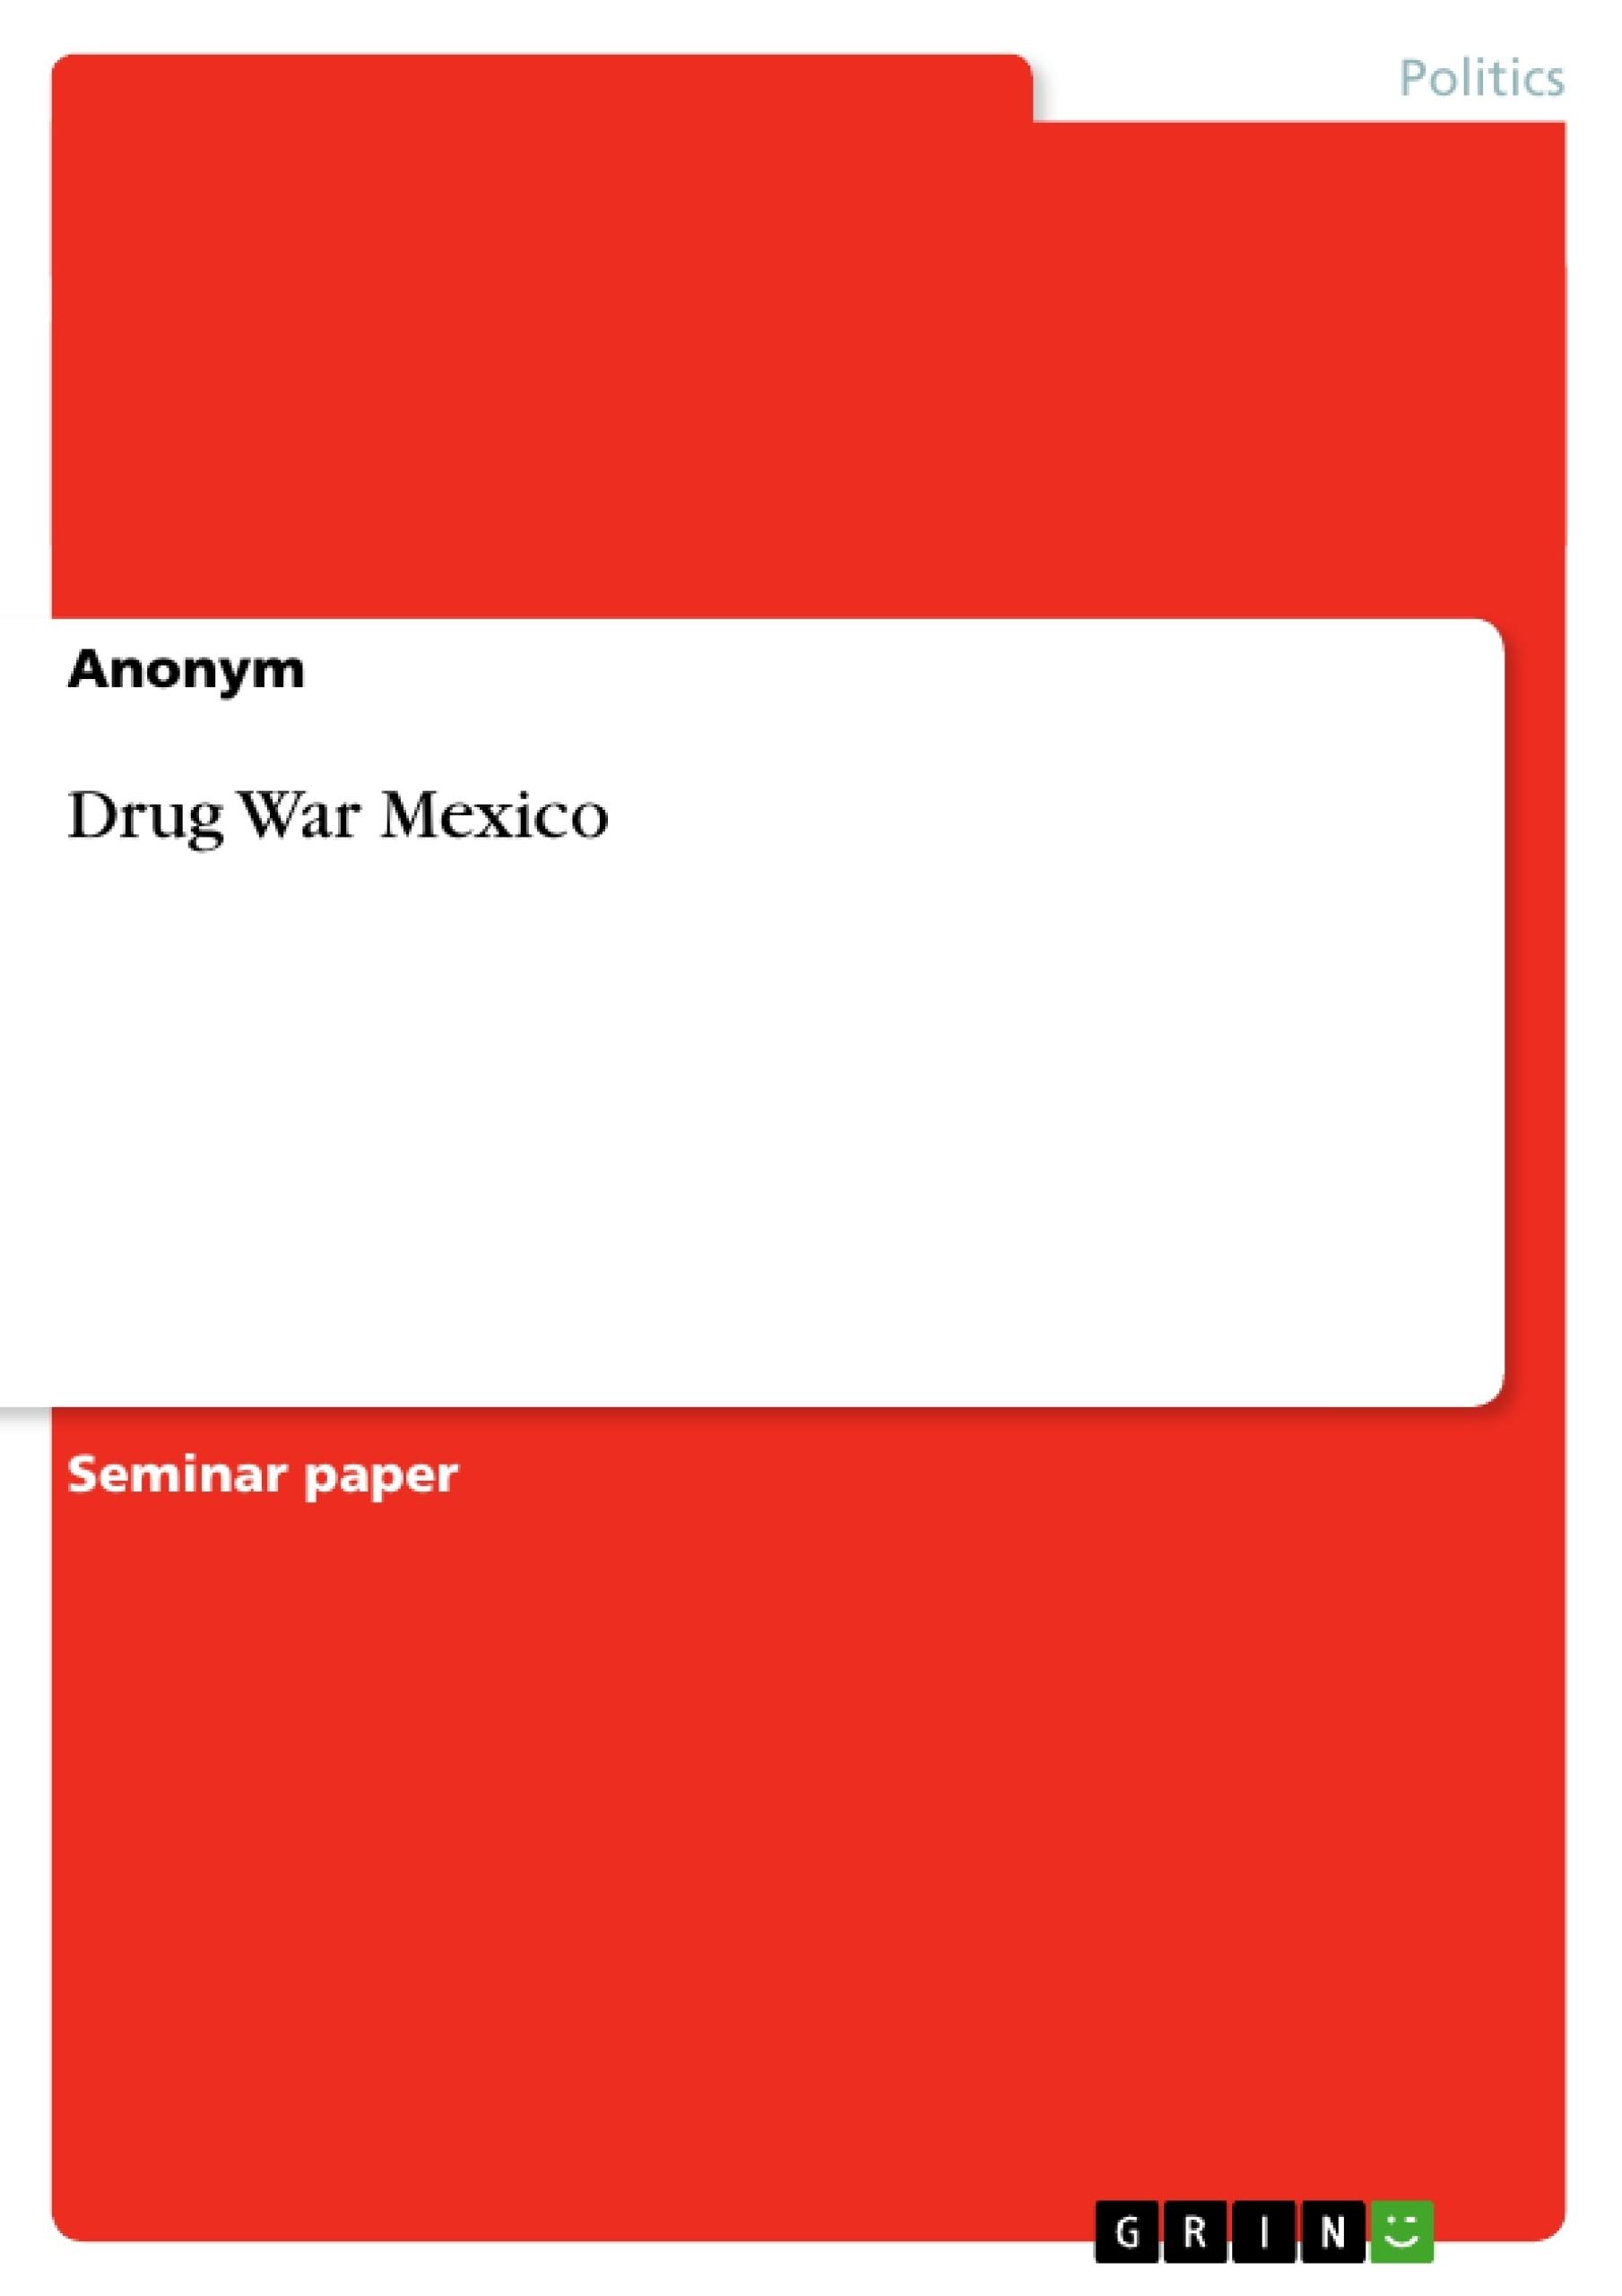 Title: Drug War Mexico